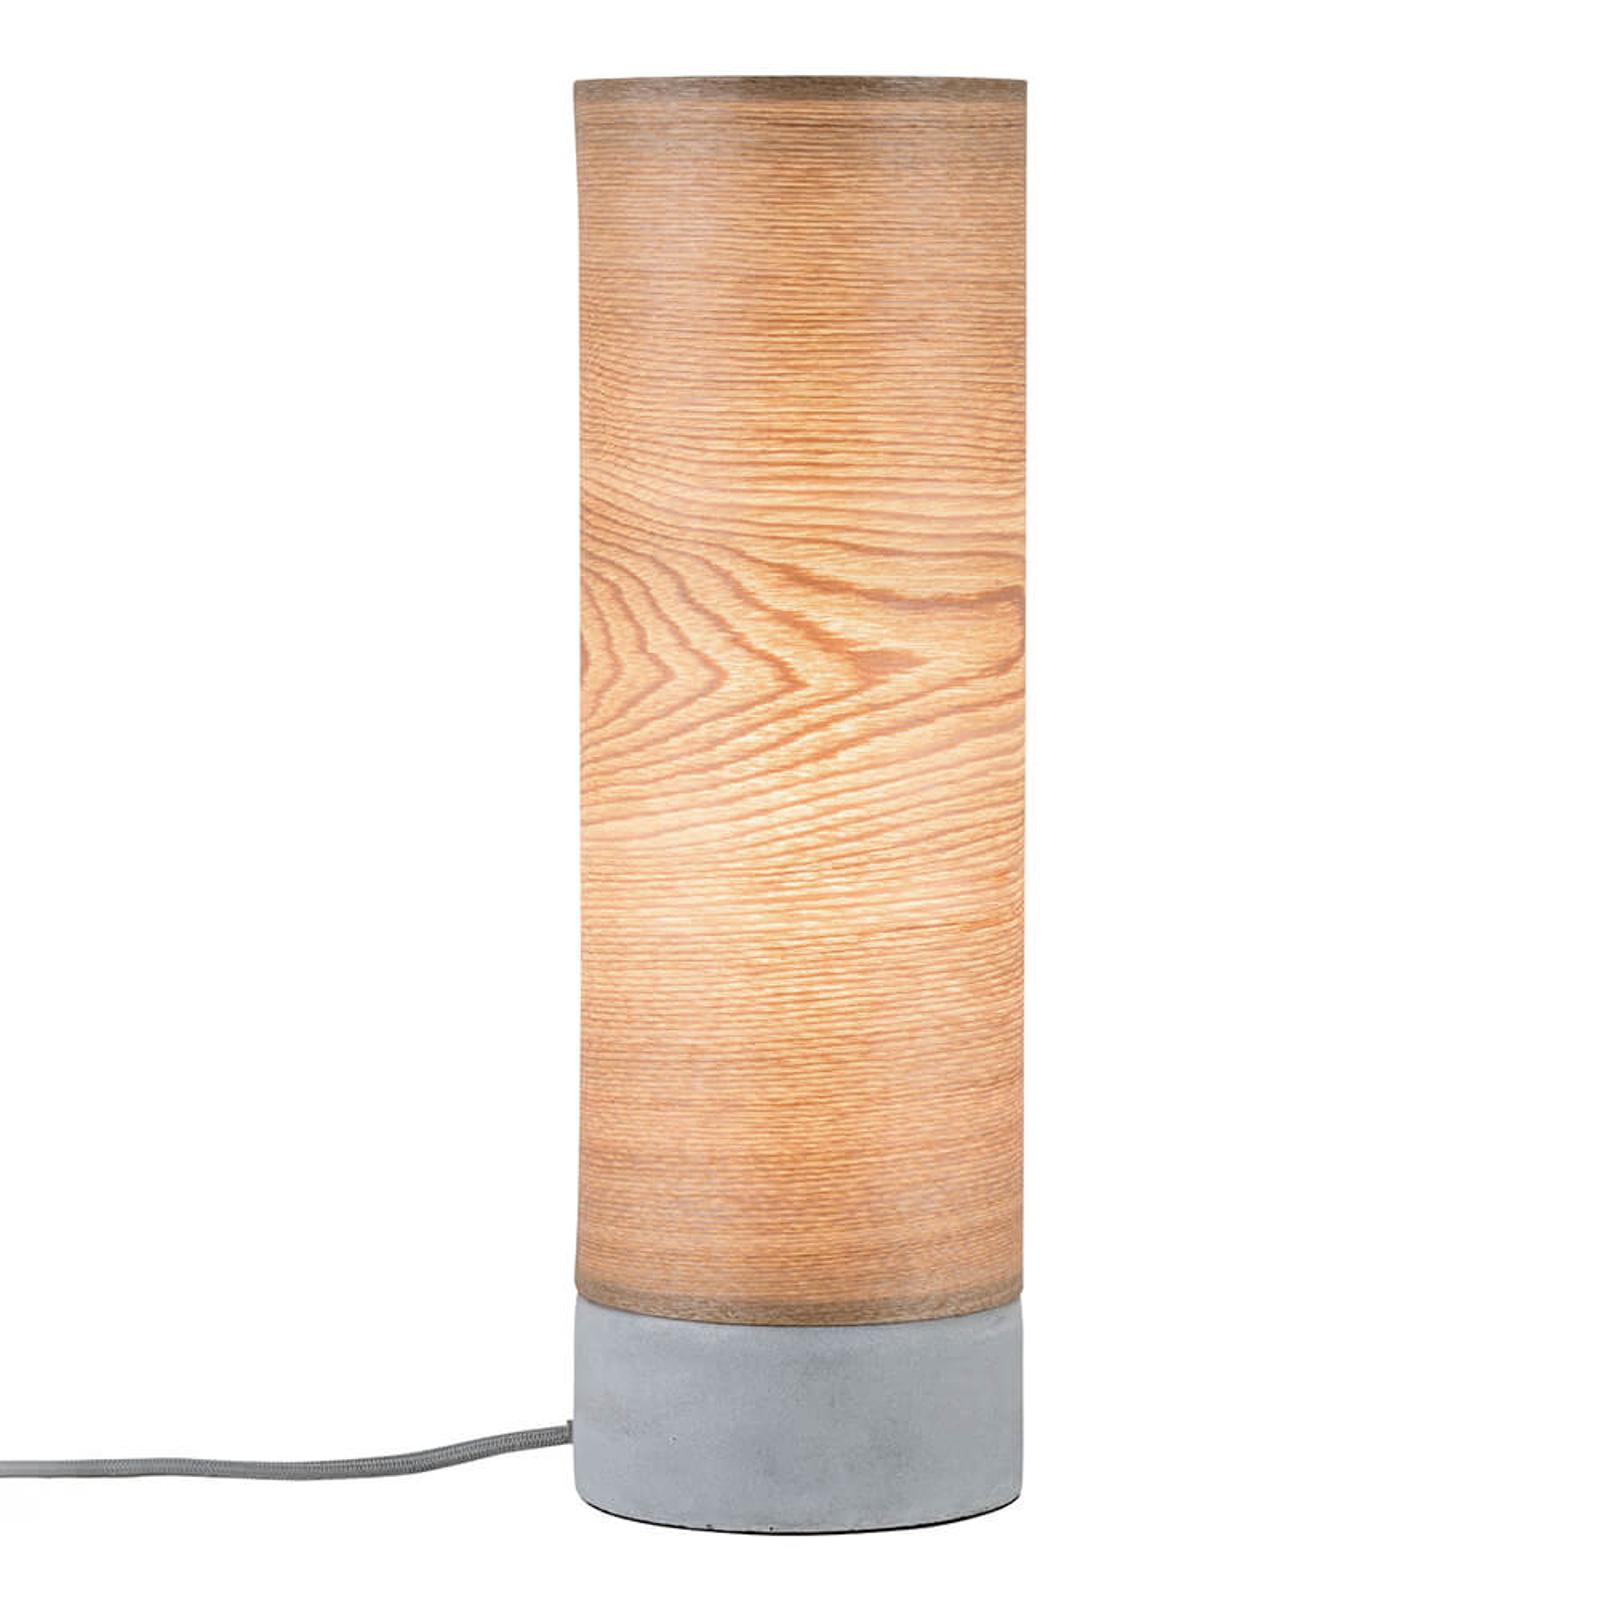 Cylindrisk bordlampe Skadi i træ med betonfod